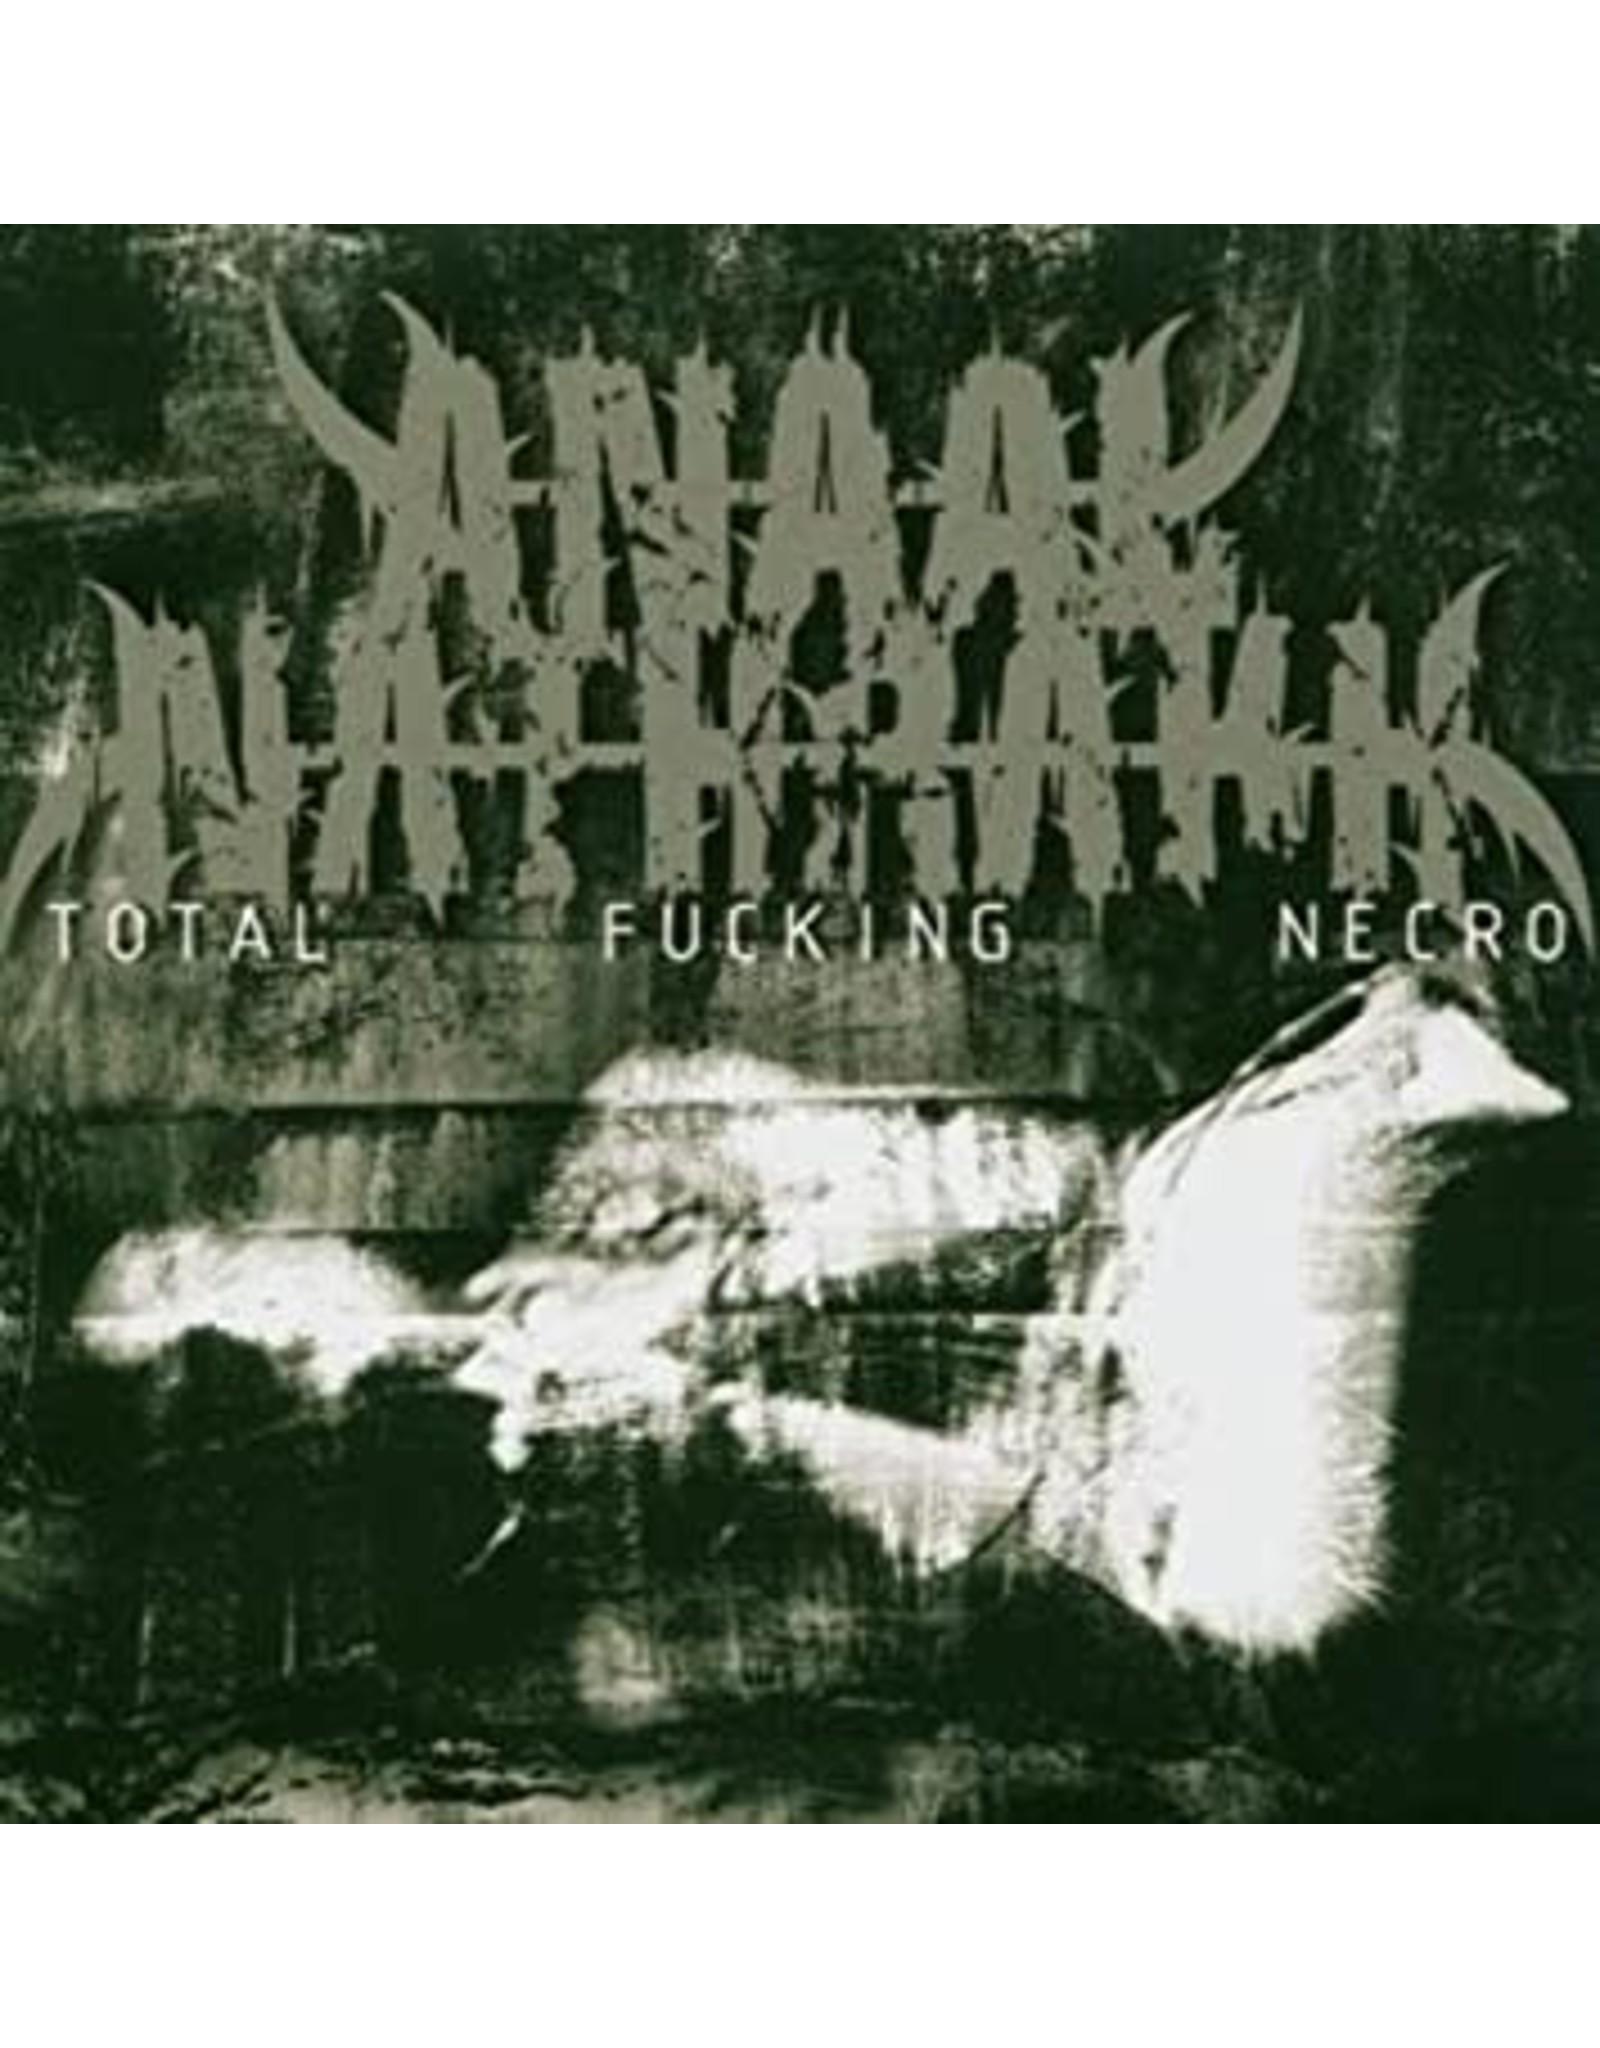 New Vinyl Anaal Nathrakh - Total Fucking Necro (Colored) LP